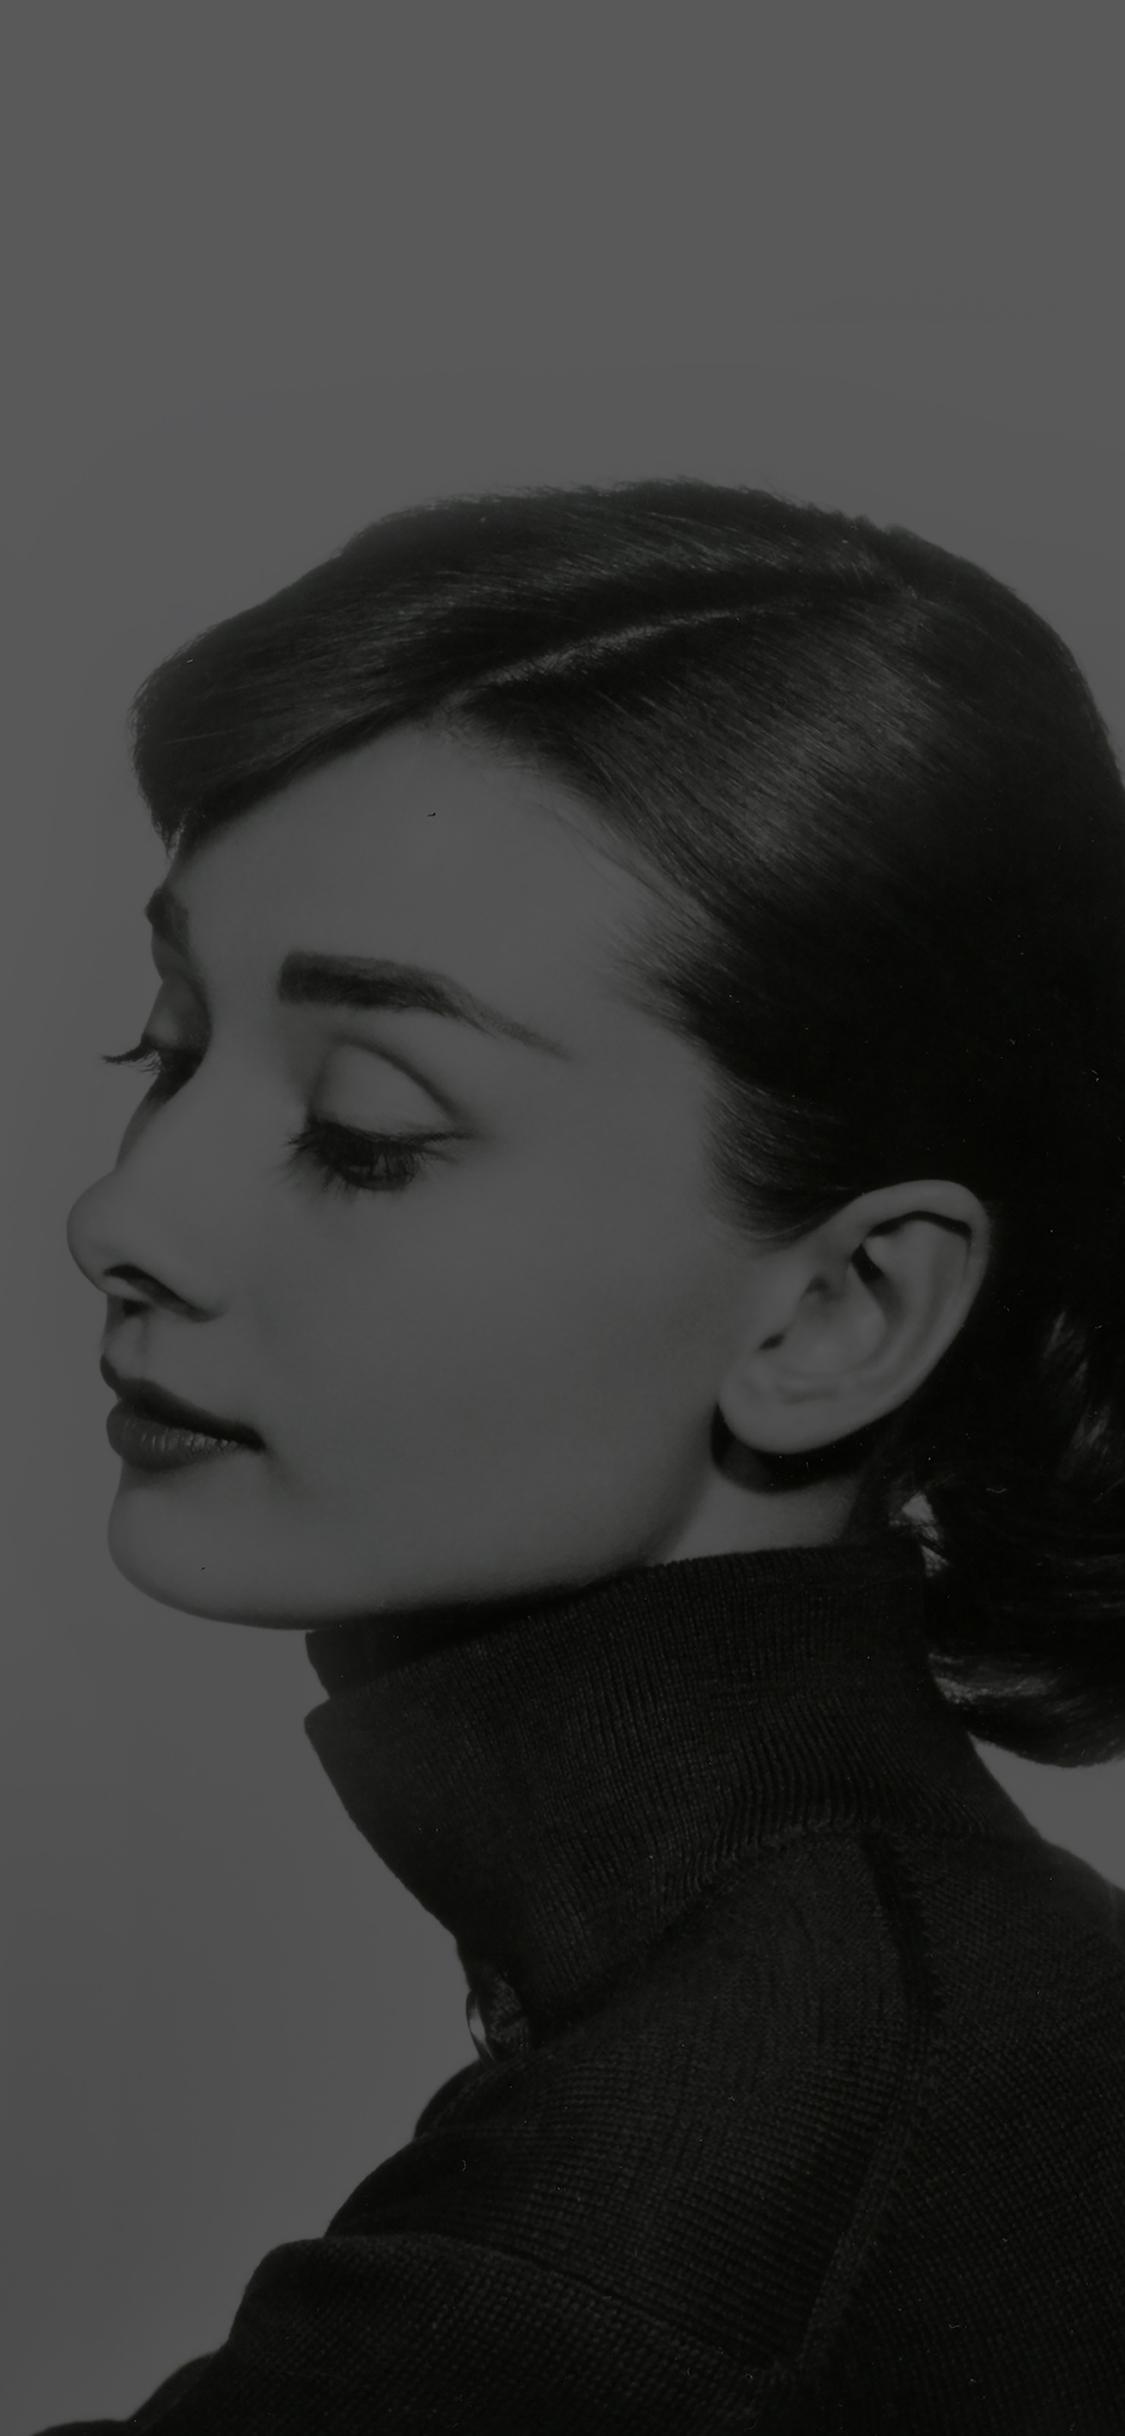 iPhoneXpapers.com-Apple-iPhone-wallpaper-hd45-audrey-hapburn-classic-dark-sexy-woman